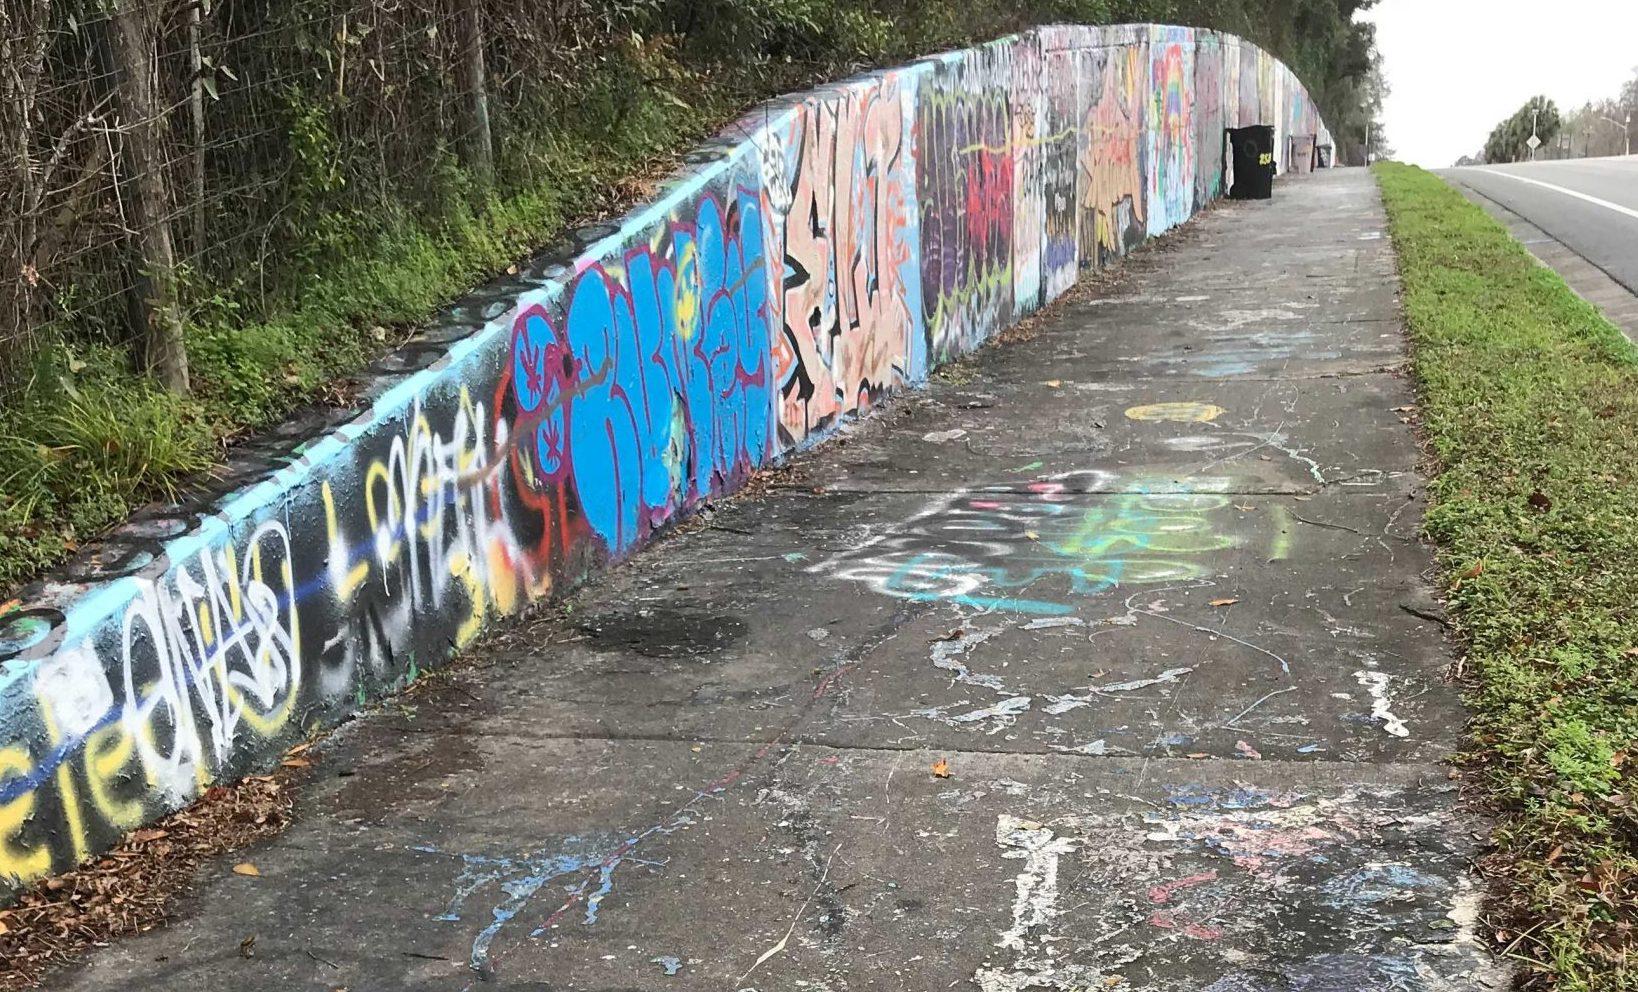 Graffiti covers the sidewalk and walls of 34th street